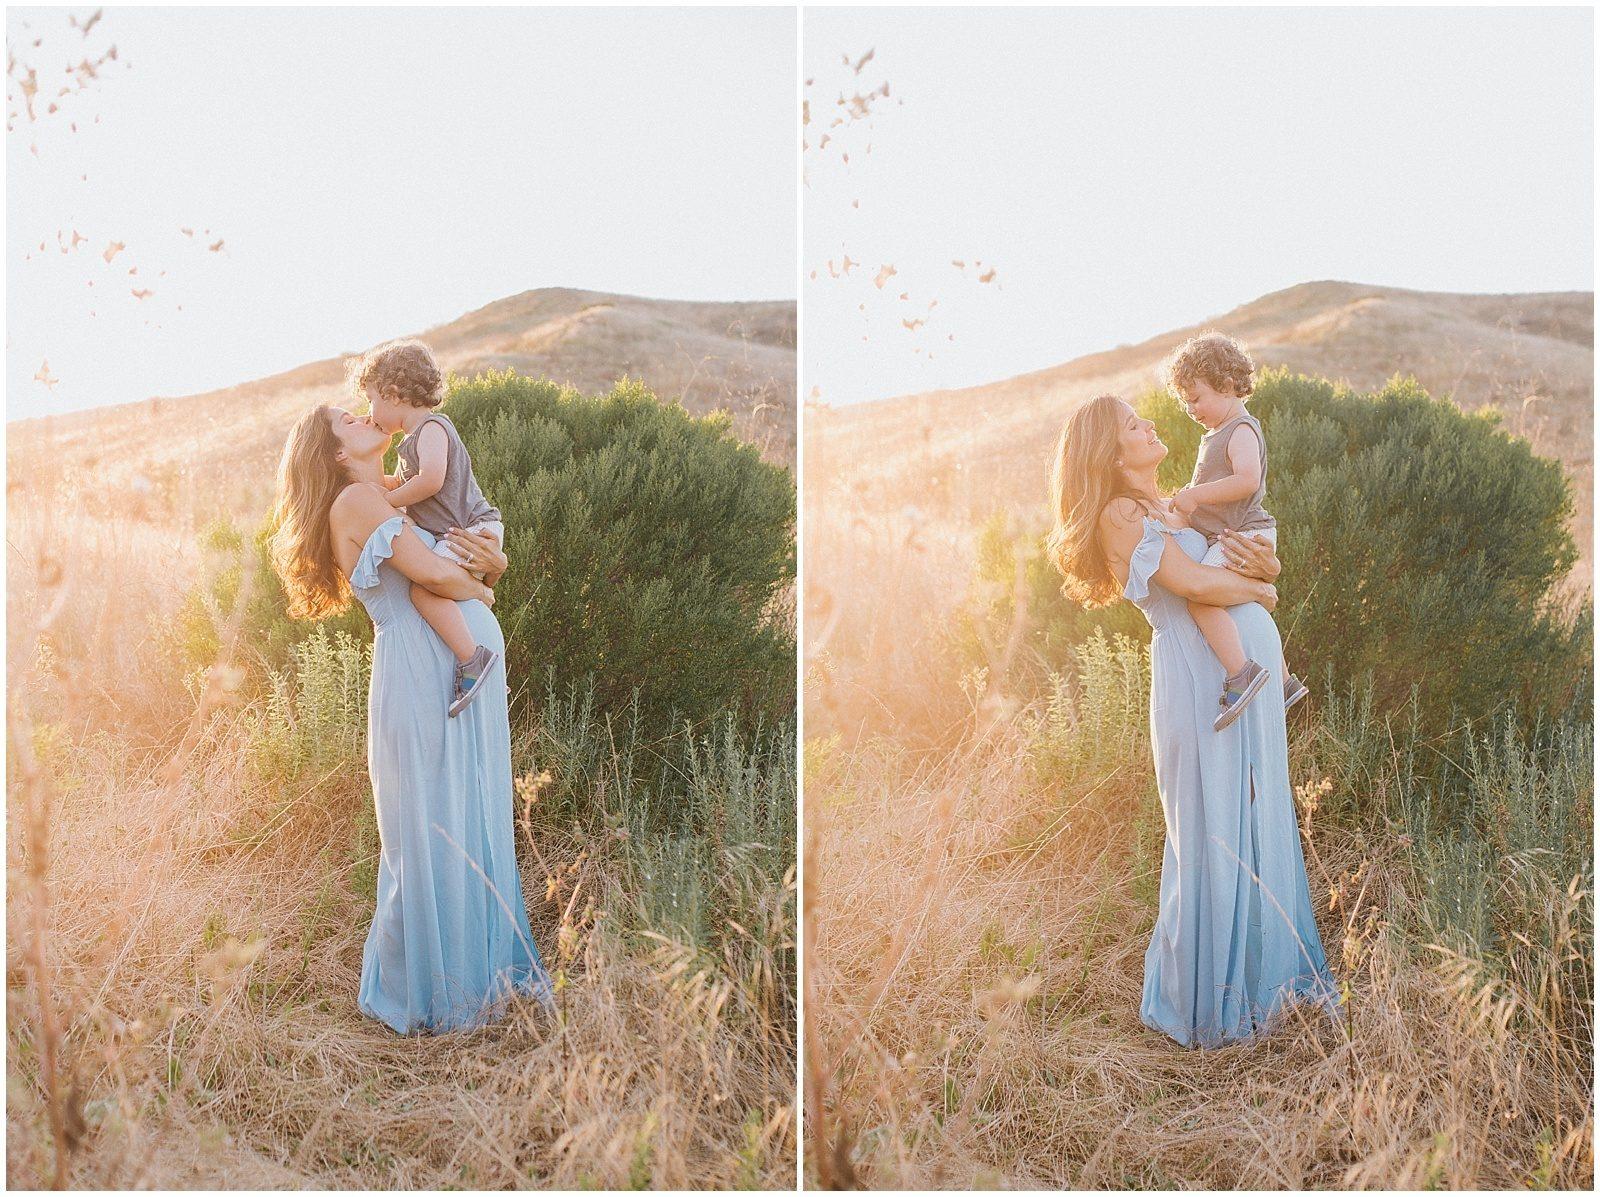 Orange County Maternity Photographer Sonja Hammad Photography 0076